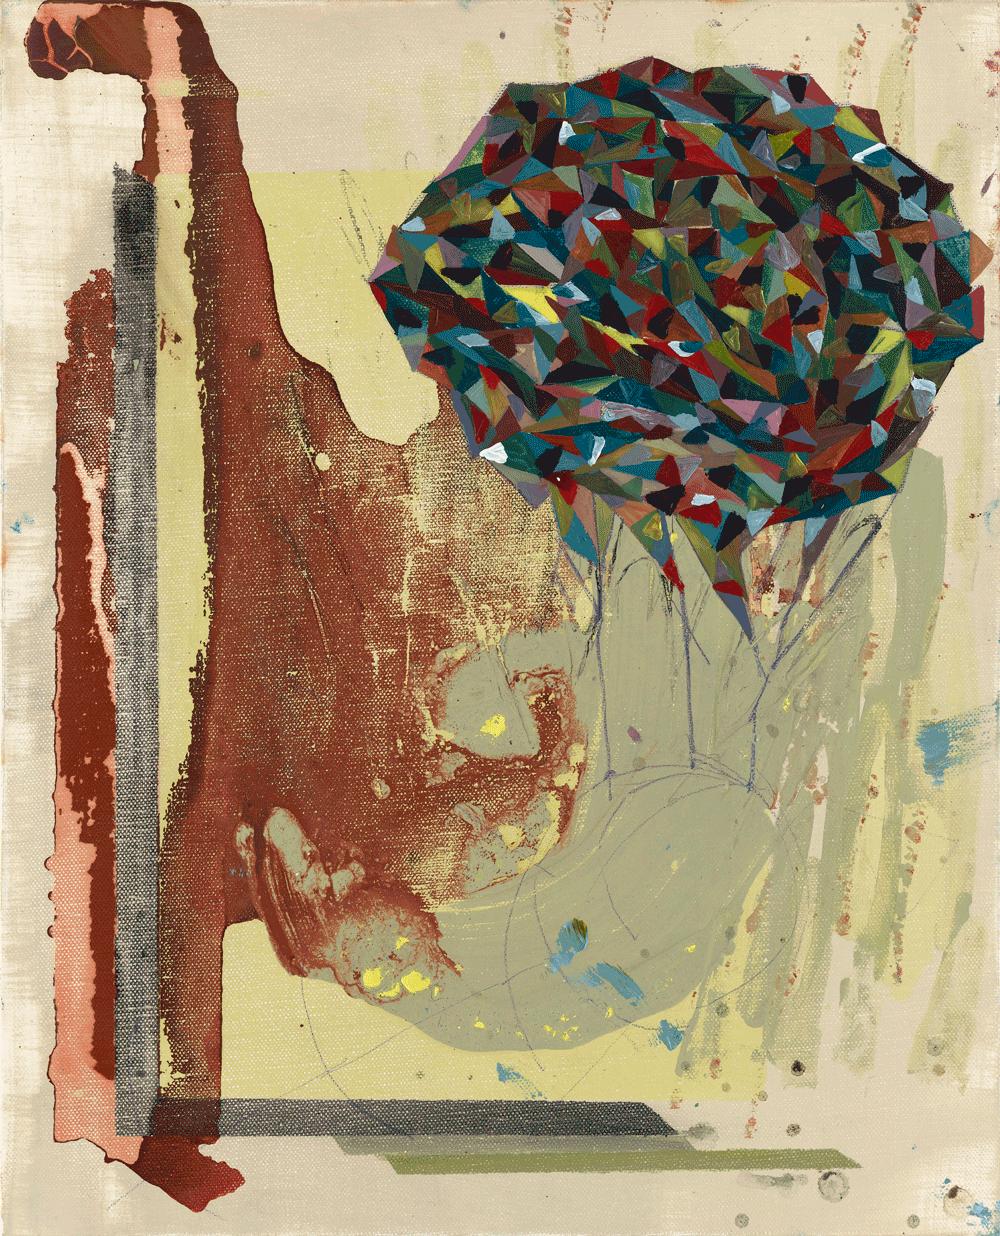 Yvonne Andreini, Multicolor Brain I, 2021 50 x 70 cm Tusche und Öl auf Leinwand